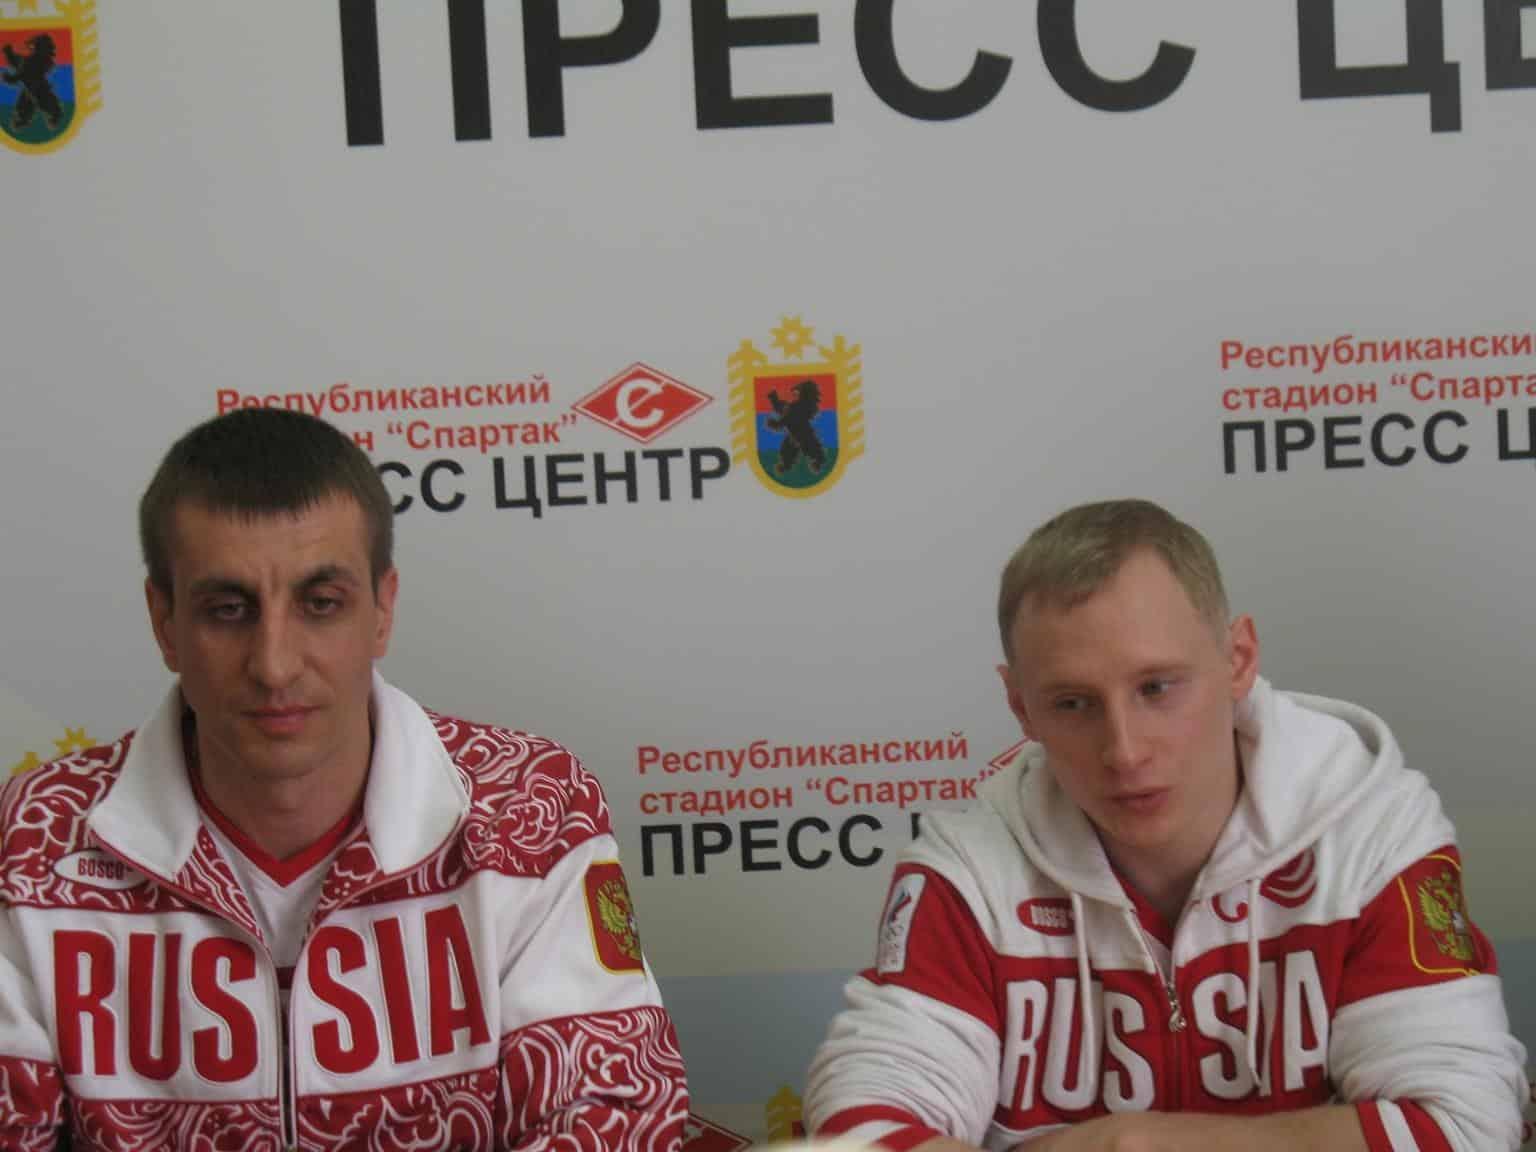 Александр Баландин: «Свою лепту в историю гимнастики я внес»